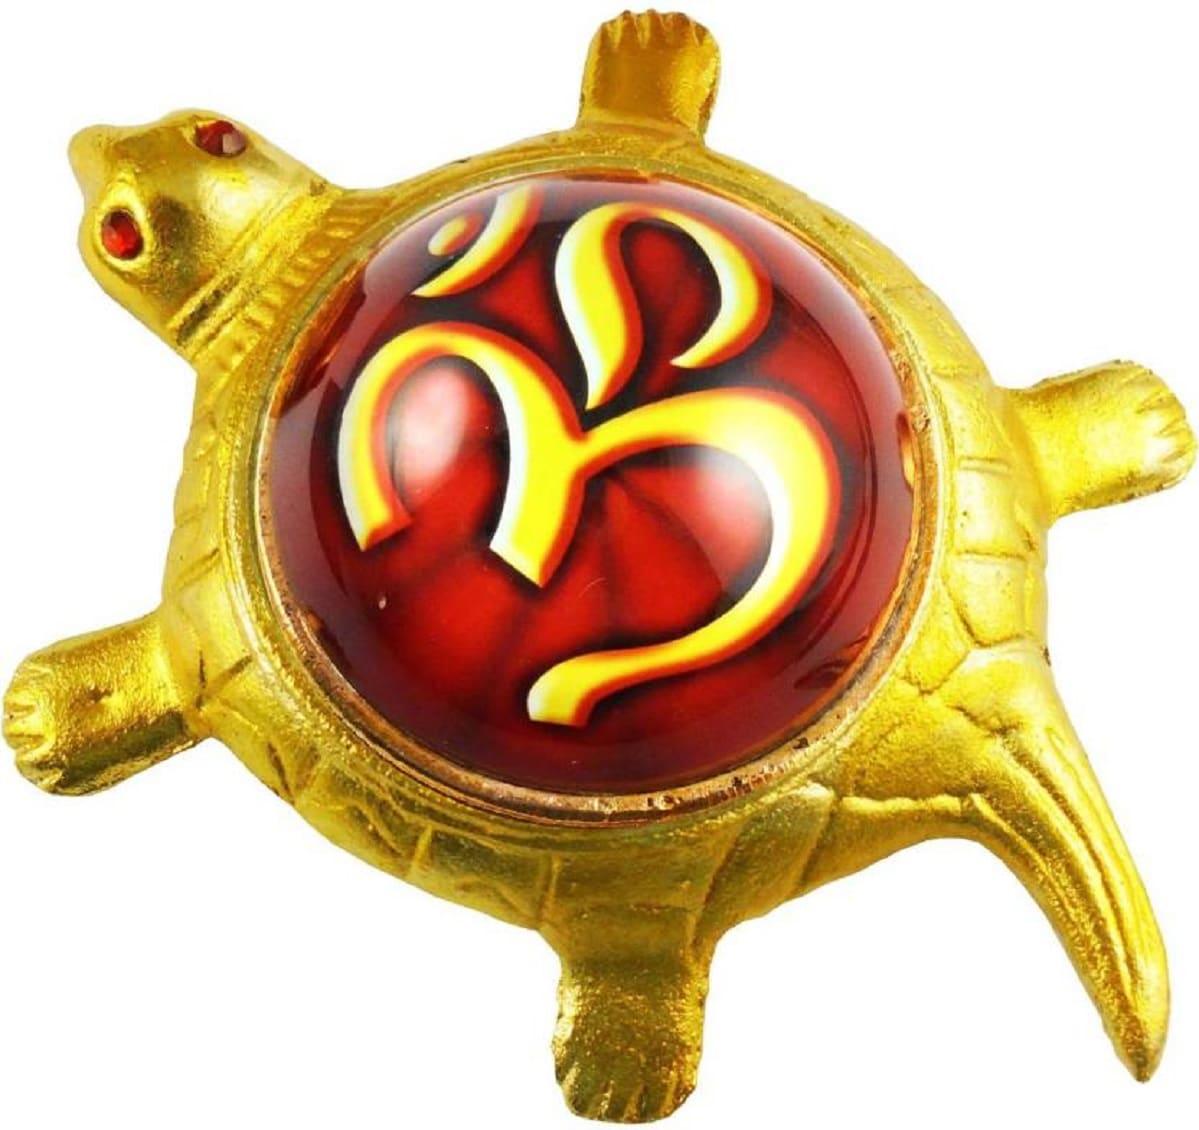 Numeroastro Om | Aum Yantra On Brass Turtle | Tortoise For Health,Wealth,Good Luck & Longivity (Small) (11 Cms) (1 Pc)